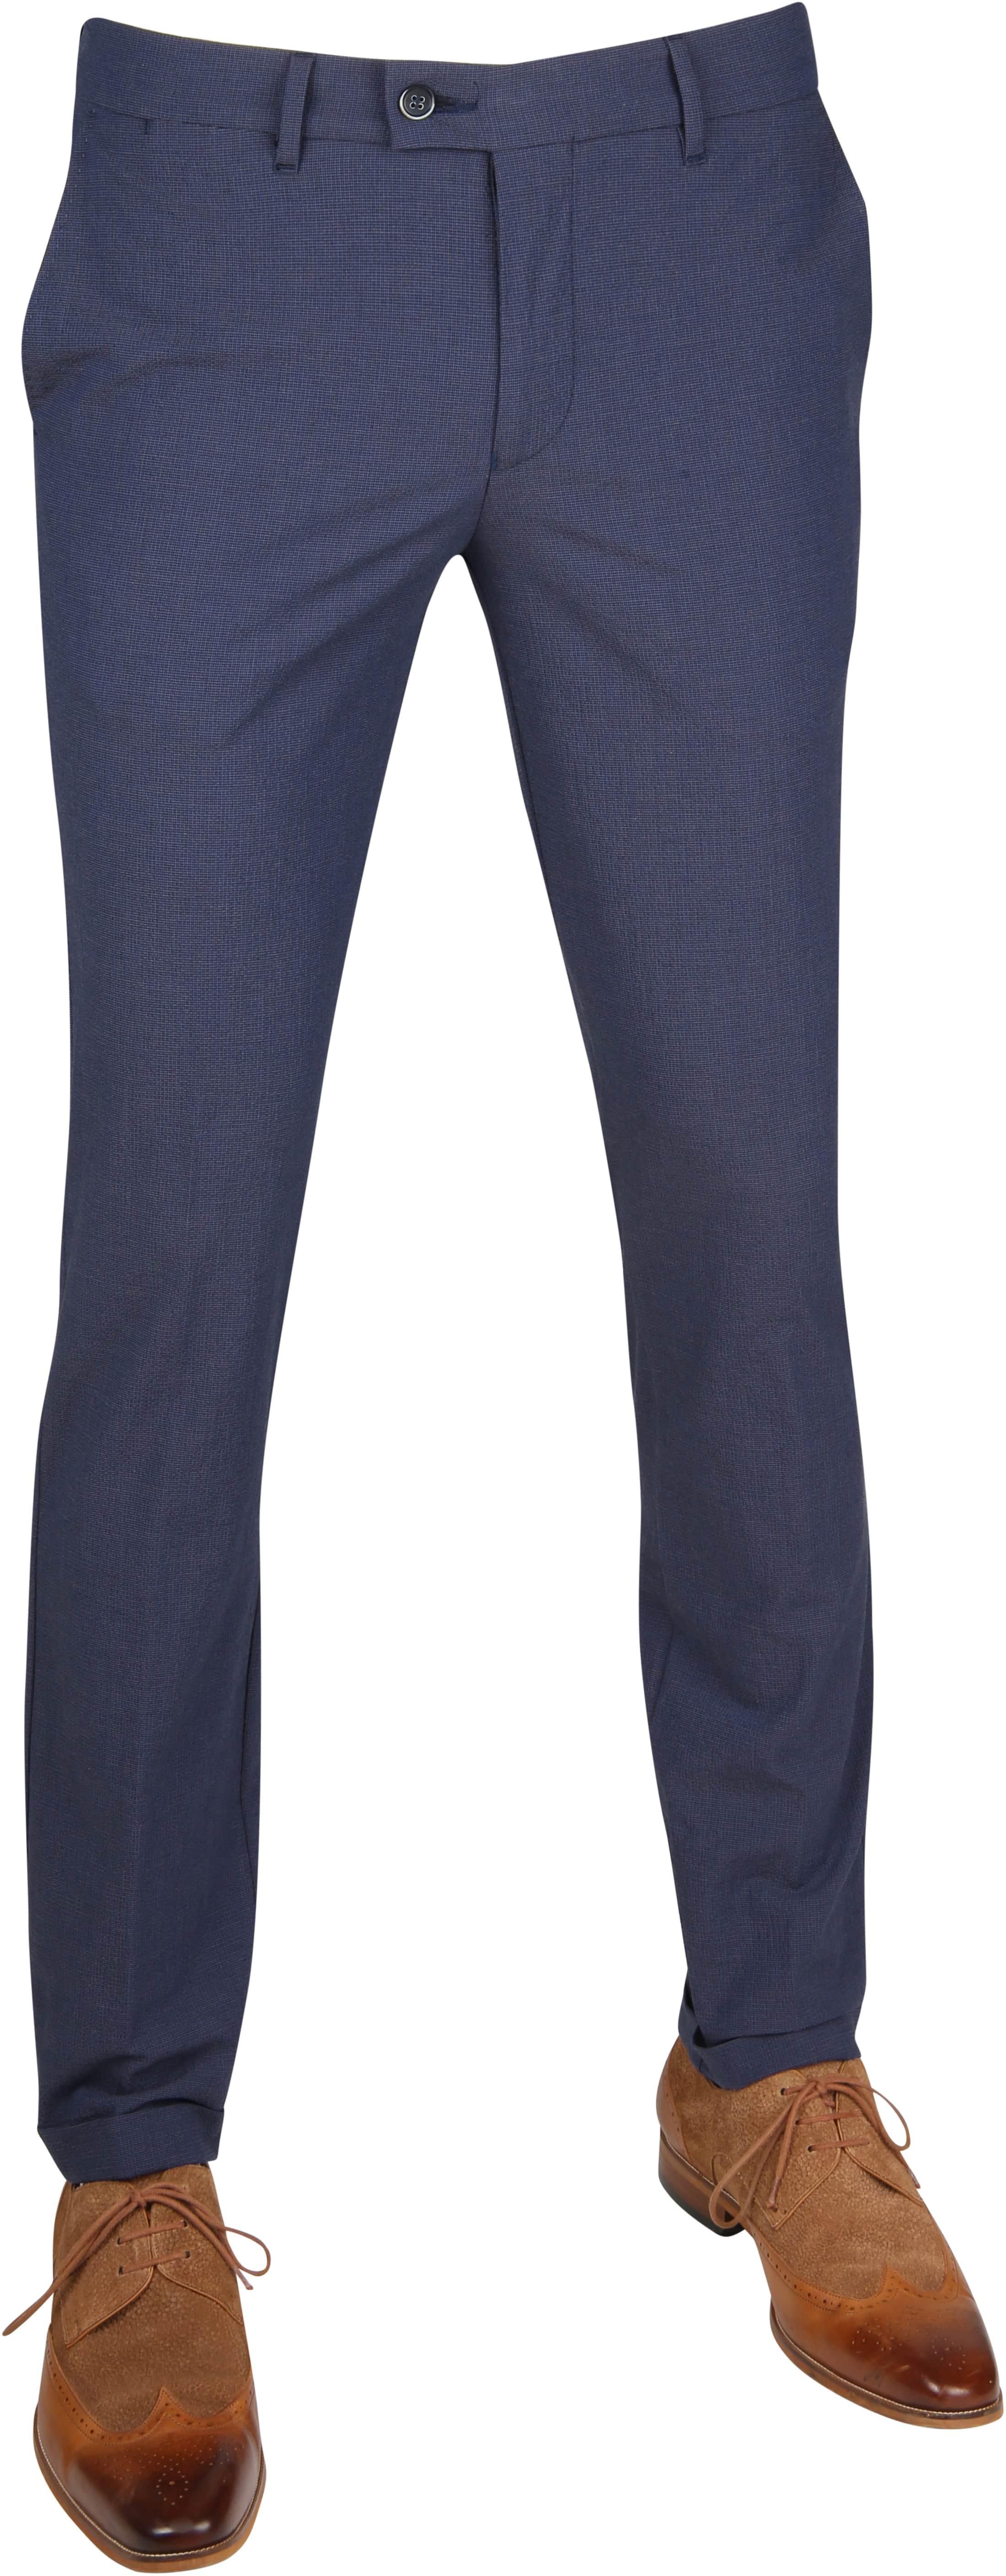 Suitable Pantalon Pisa Dessin Blauw foto 0